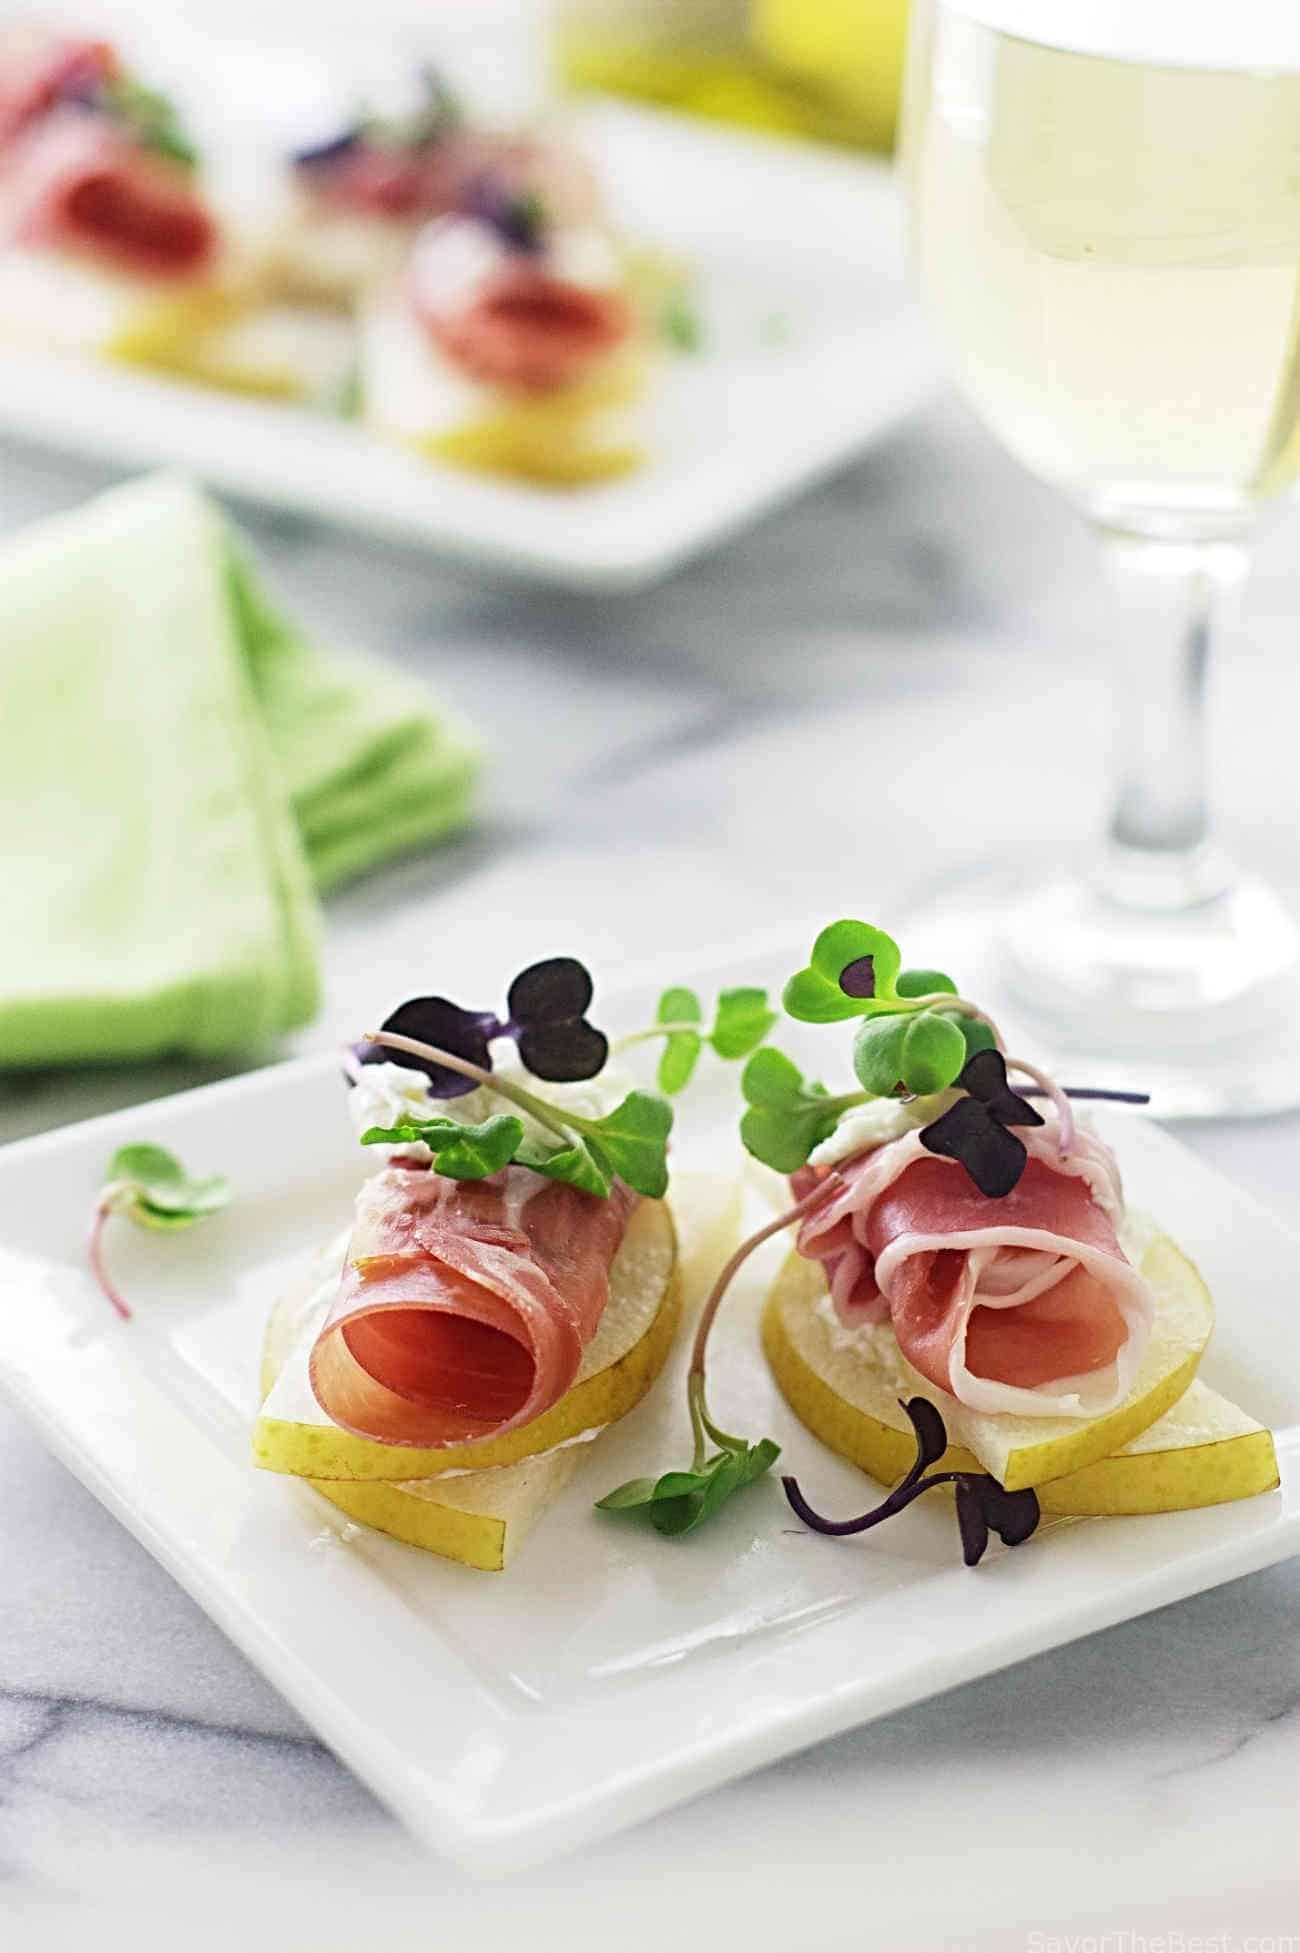 Asian Pear, Prosciutto Appetizers